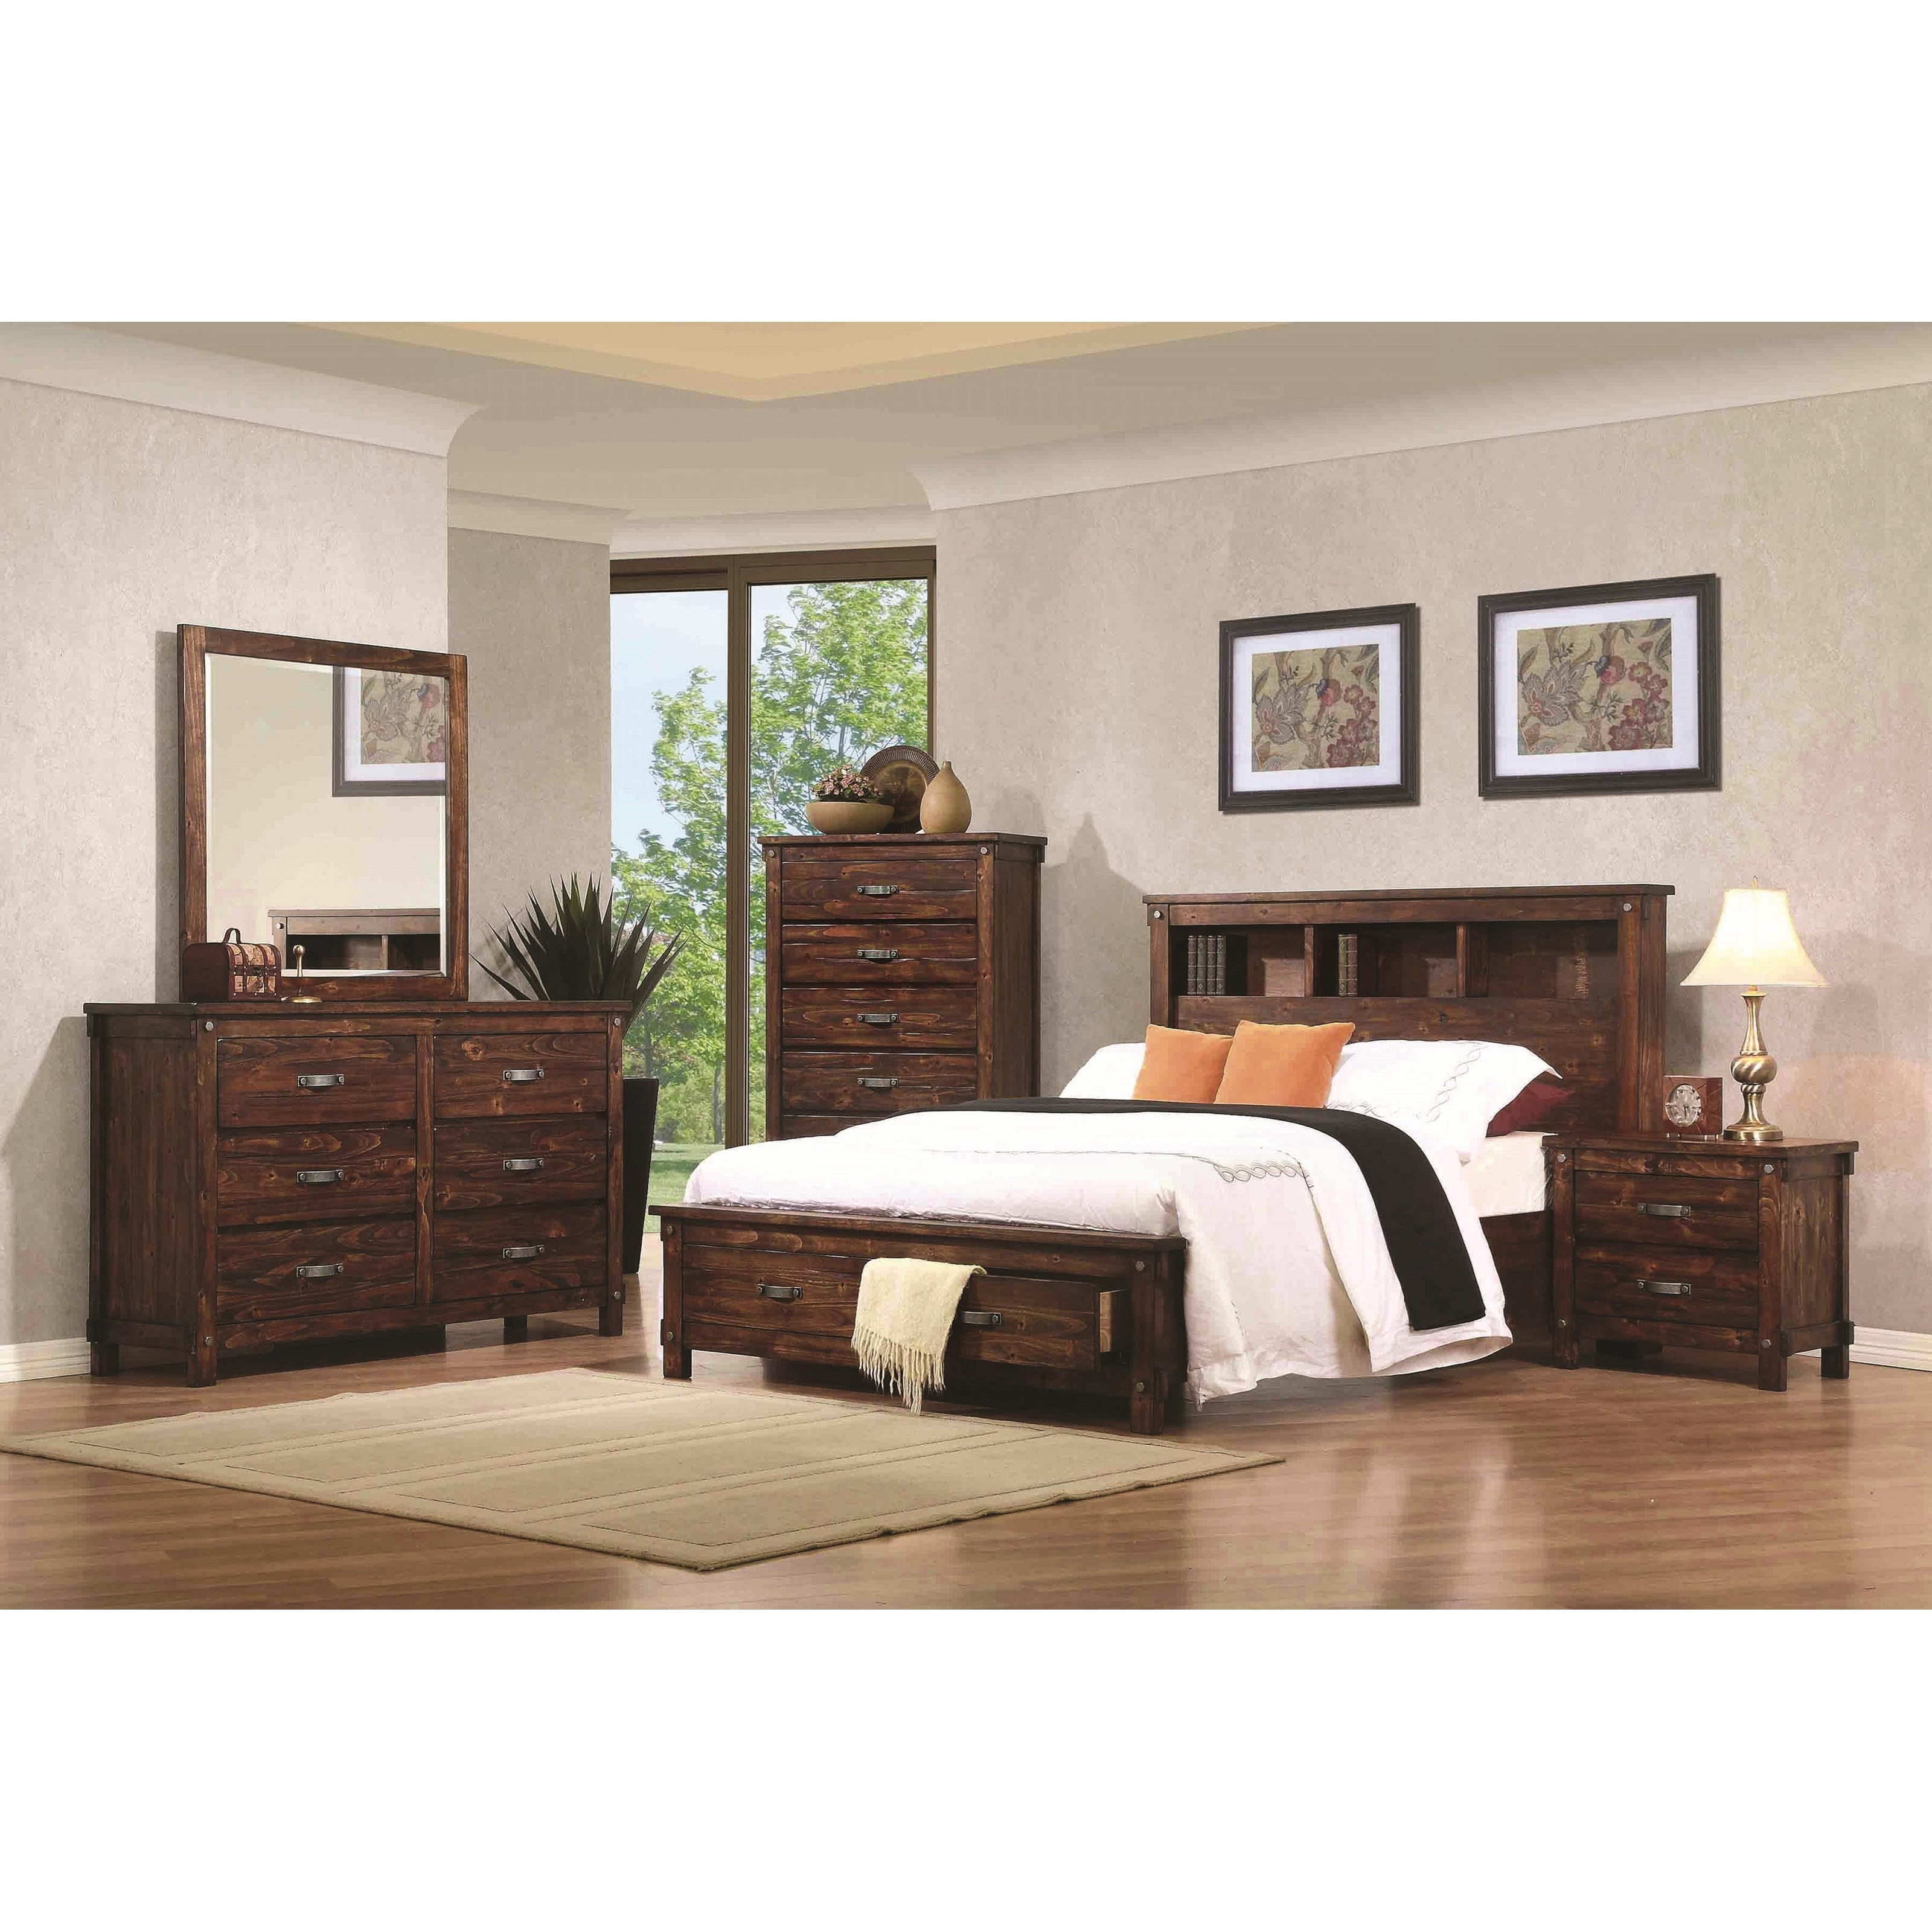 Coaster Noble King Bedroom Group - Item Number: B219 K Bedroom Group 2